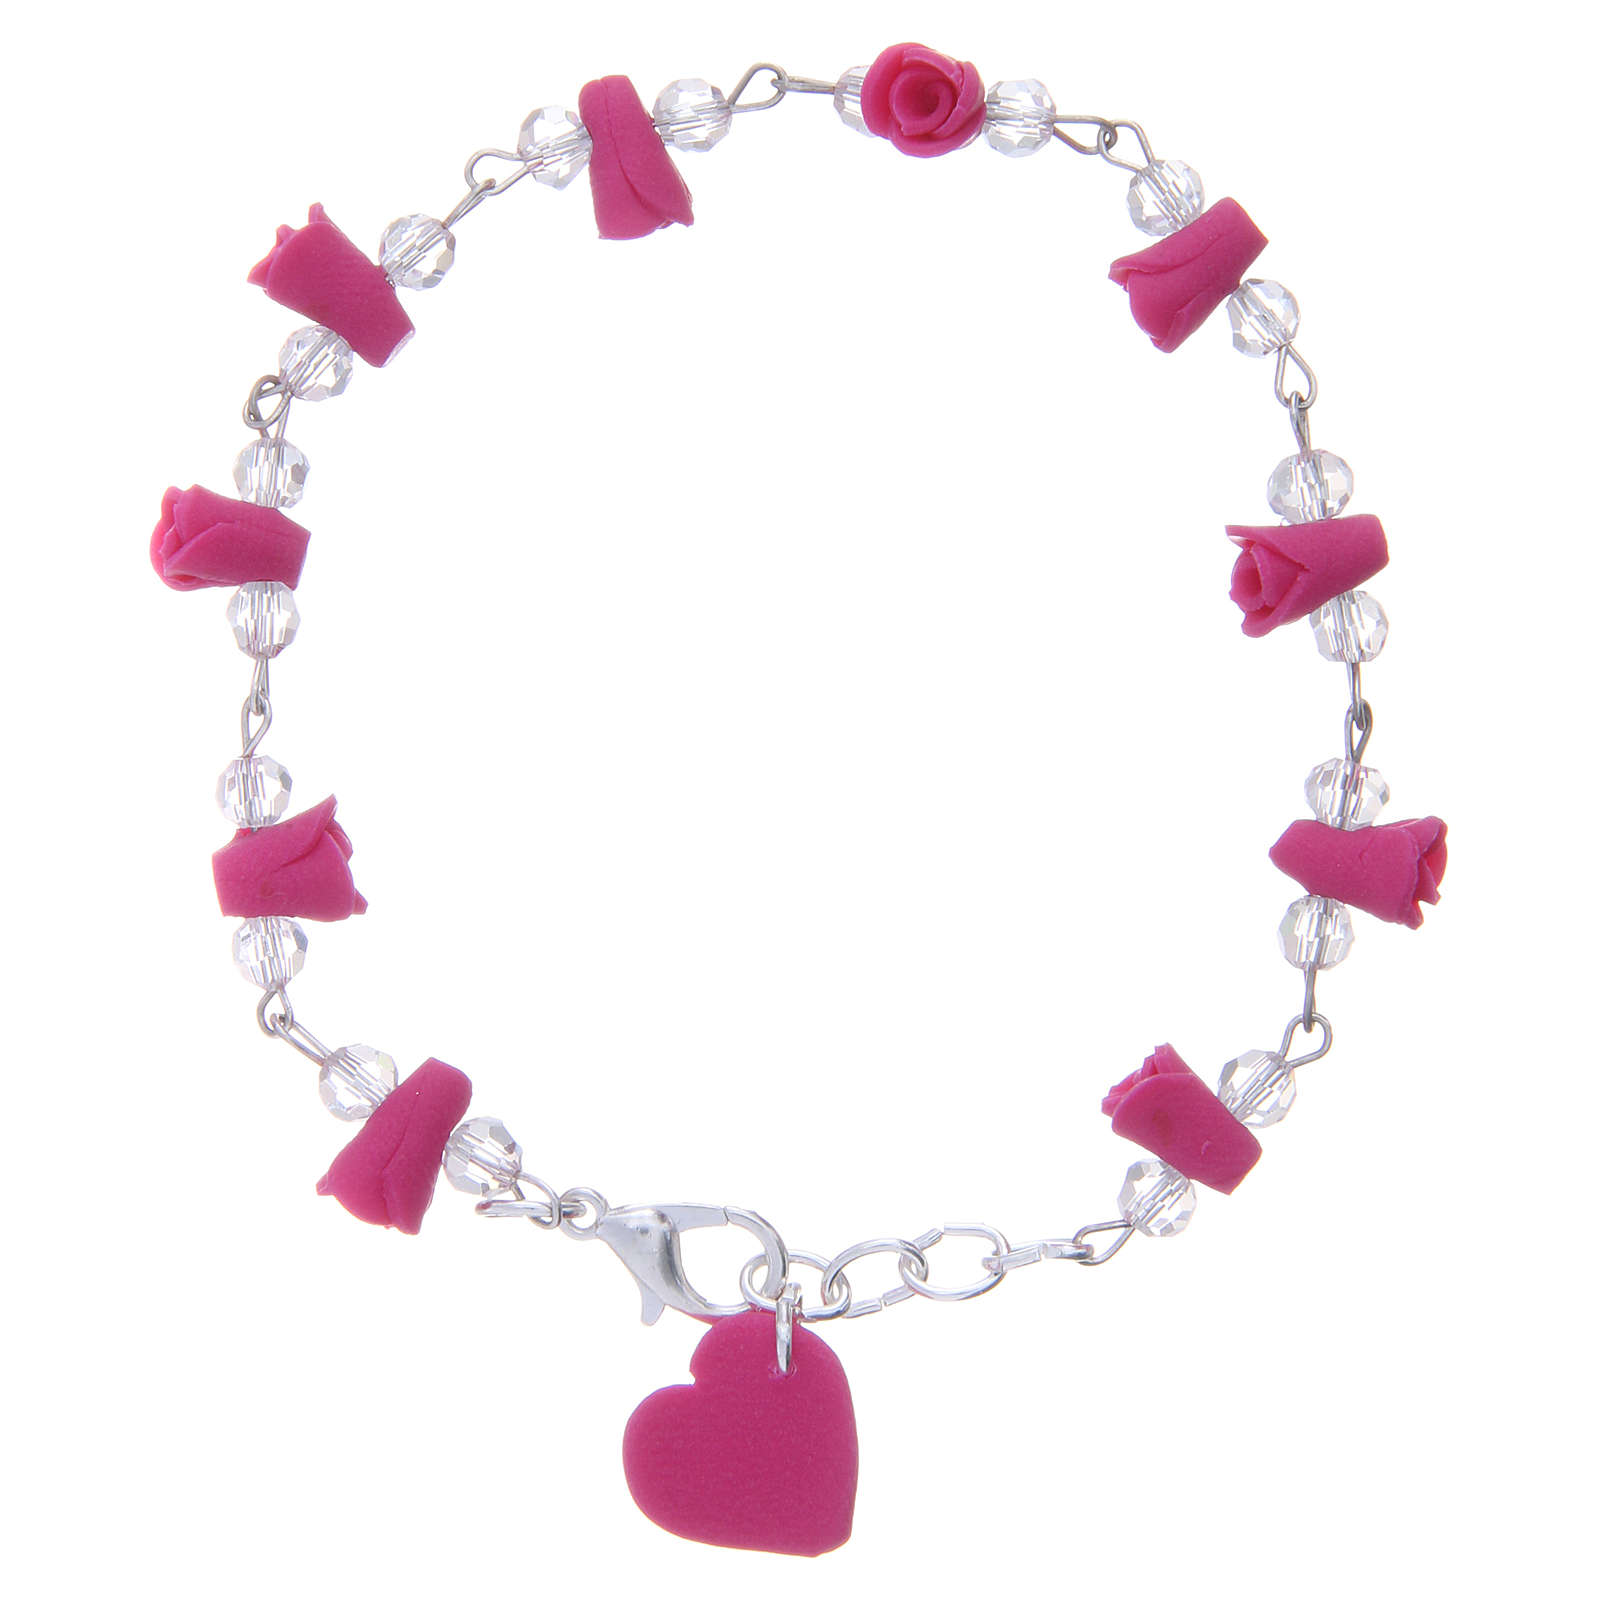 Bracciale Medjugorje rose e cuore ceramica fucsia 4